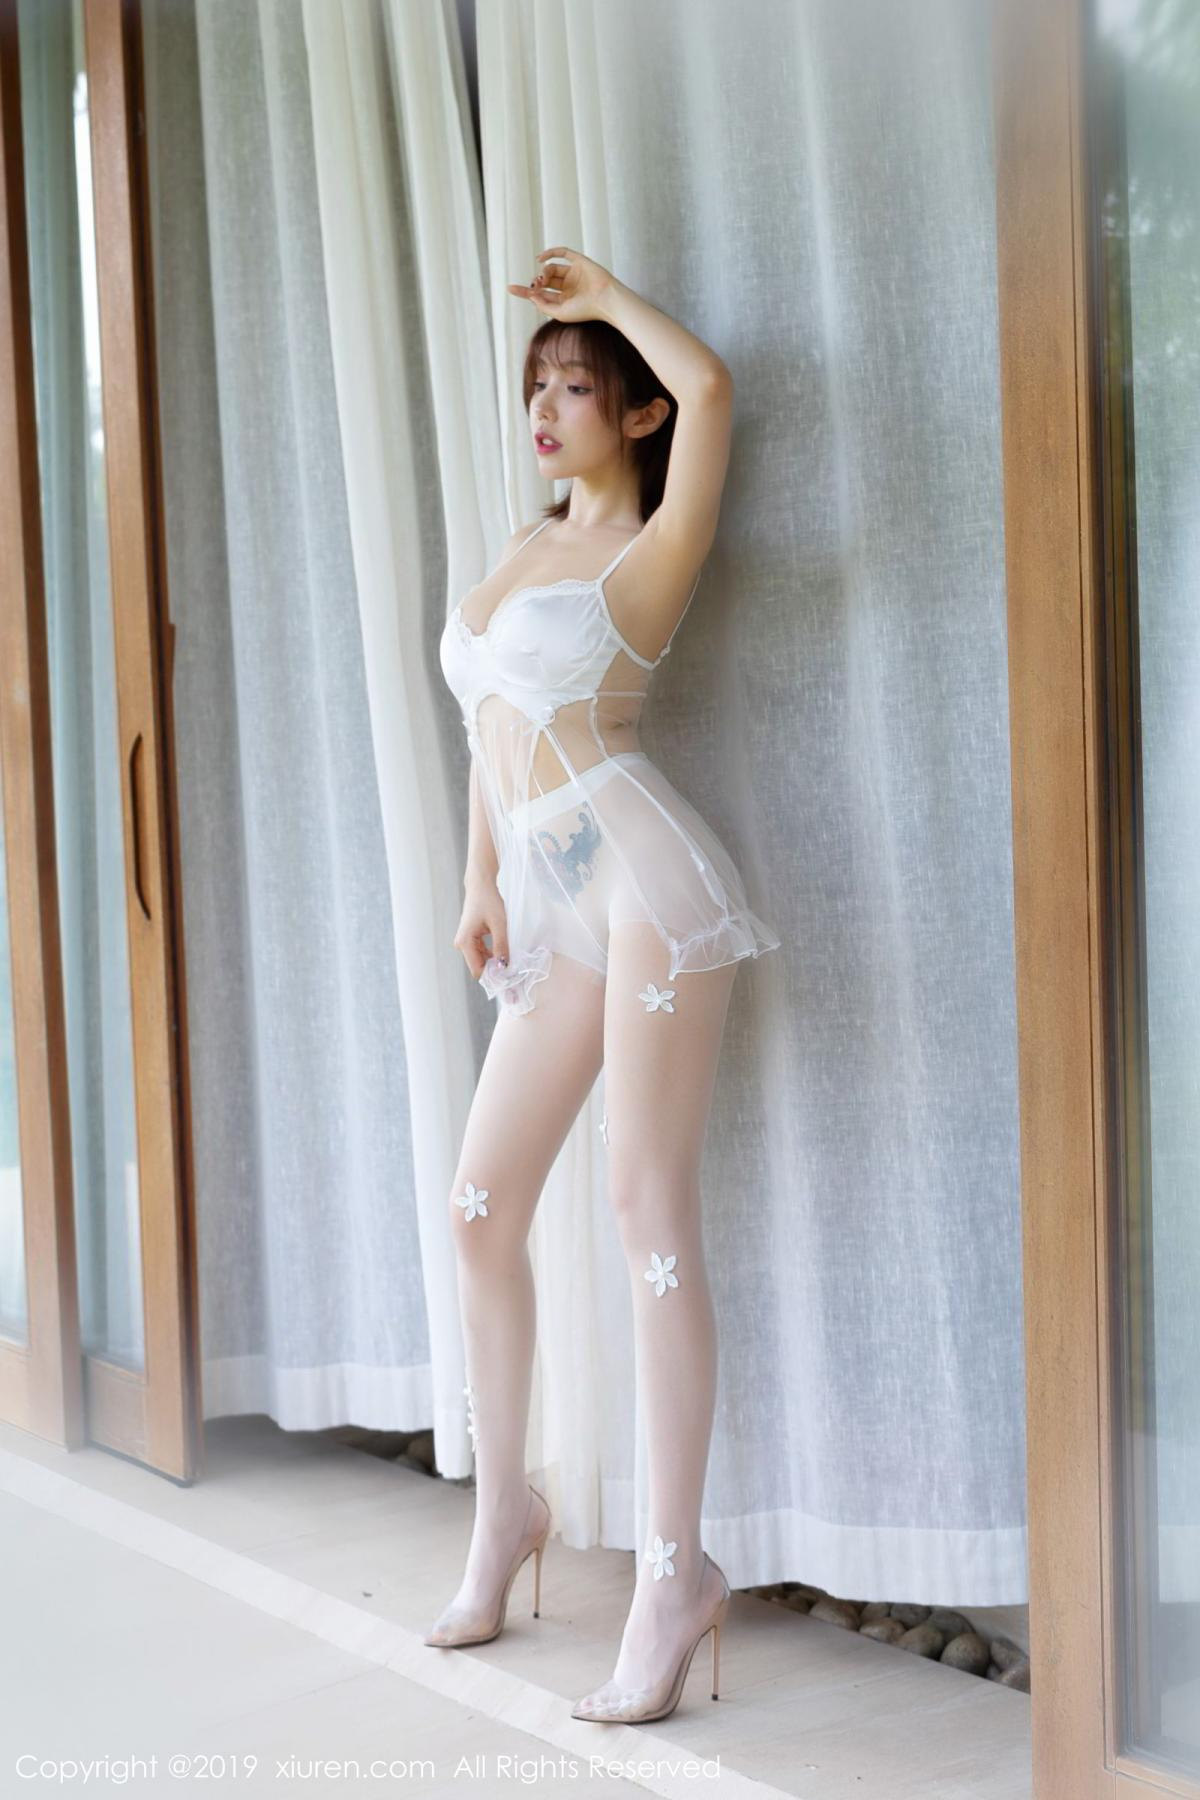 [XiuRen] Vol.1578 Huang Le Ran 7P, Huang Le Ran, Underwear, Xiuren